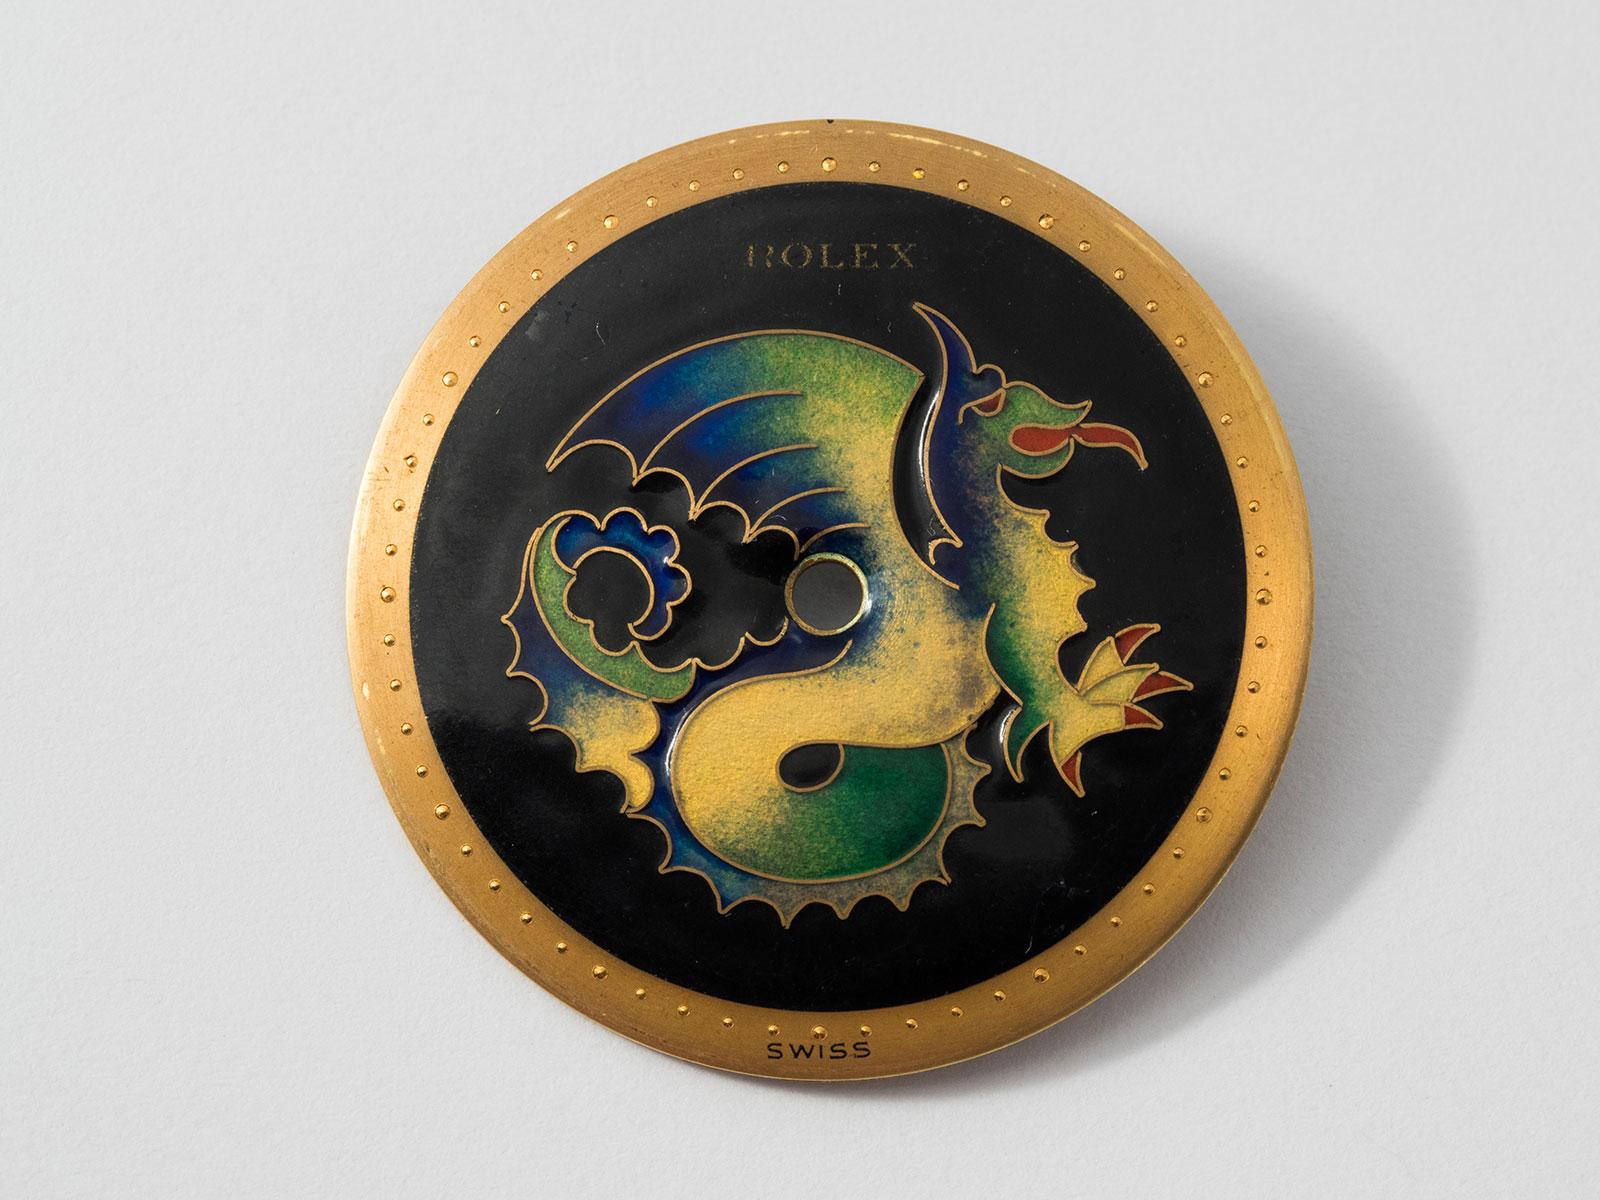 Rolex ref. 8651 cloisonné chimera Stern Freres 2